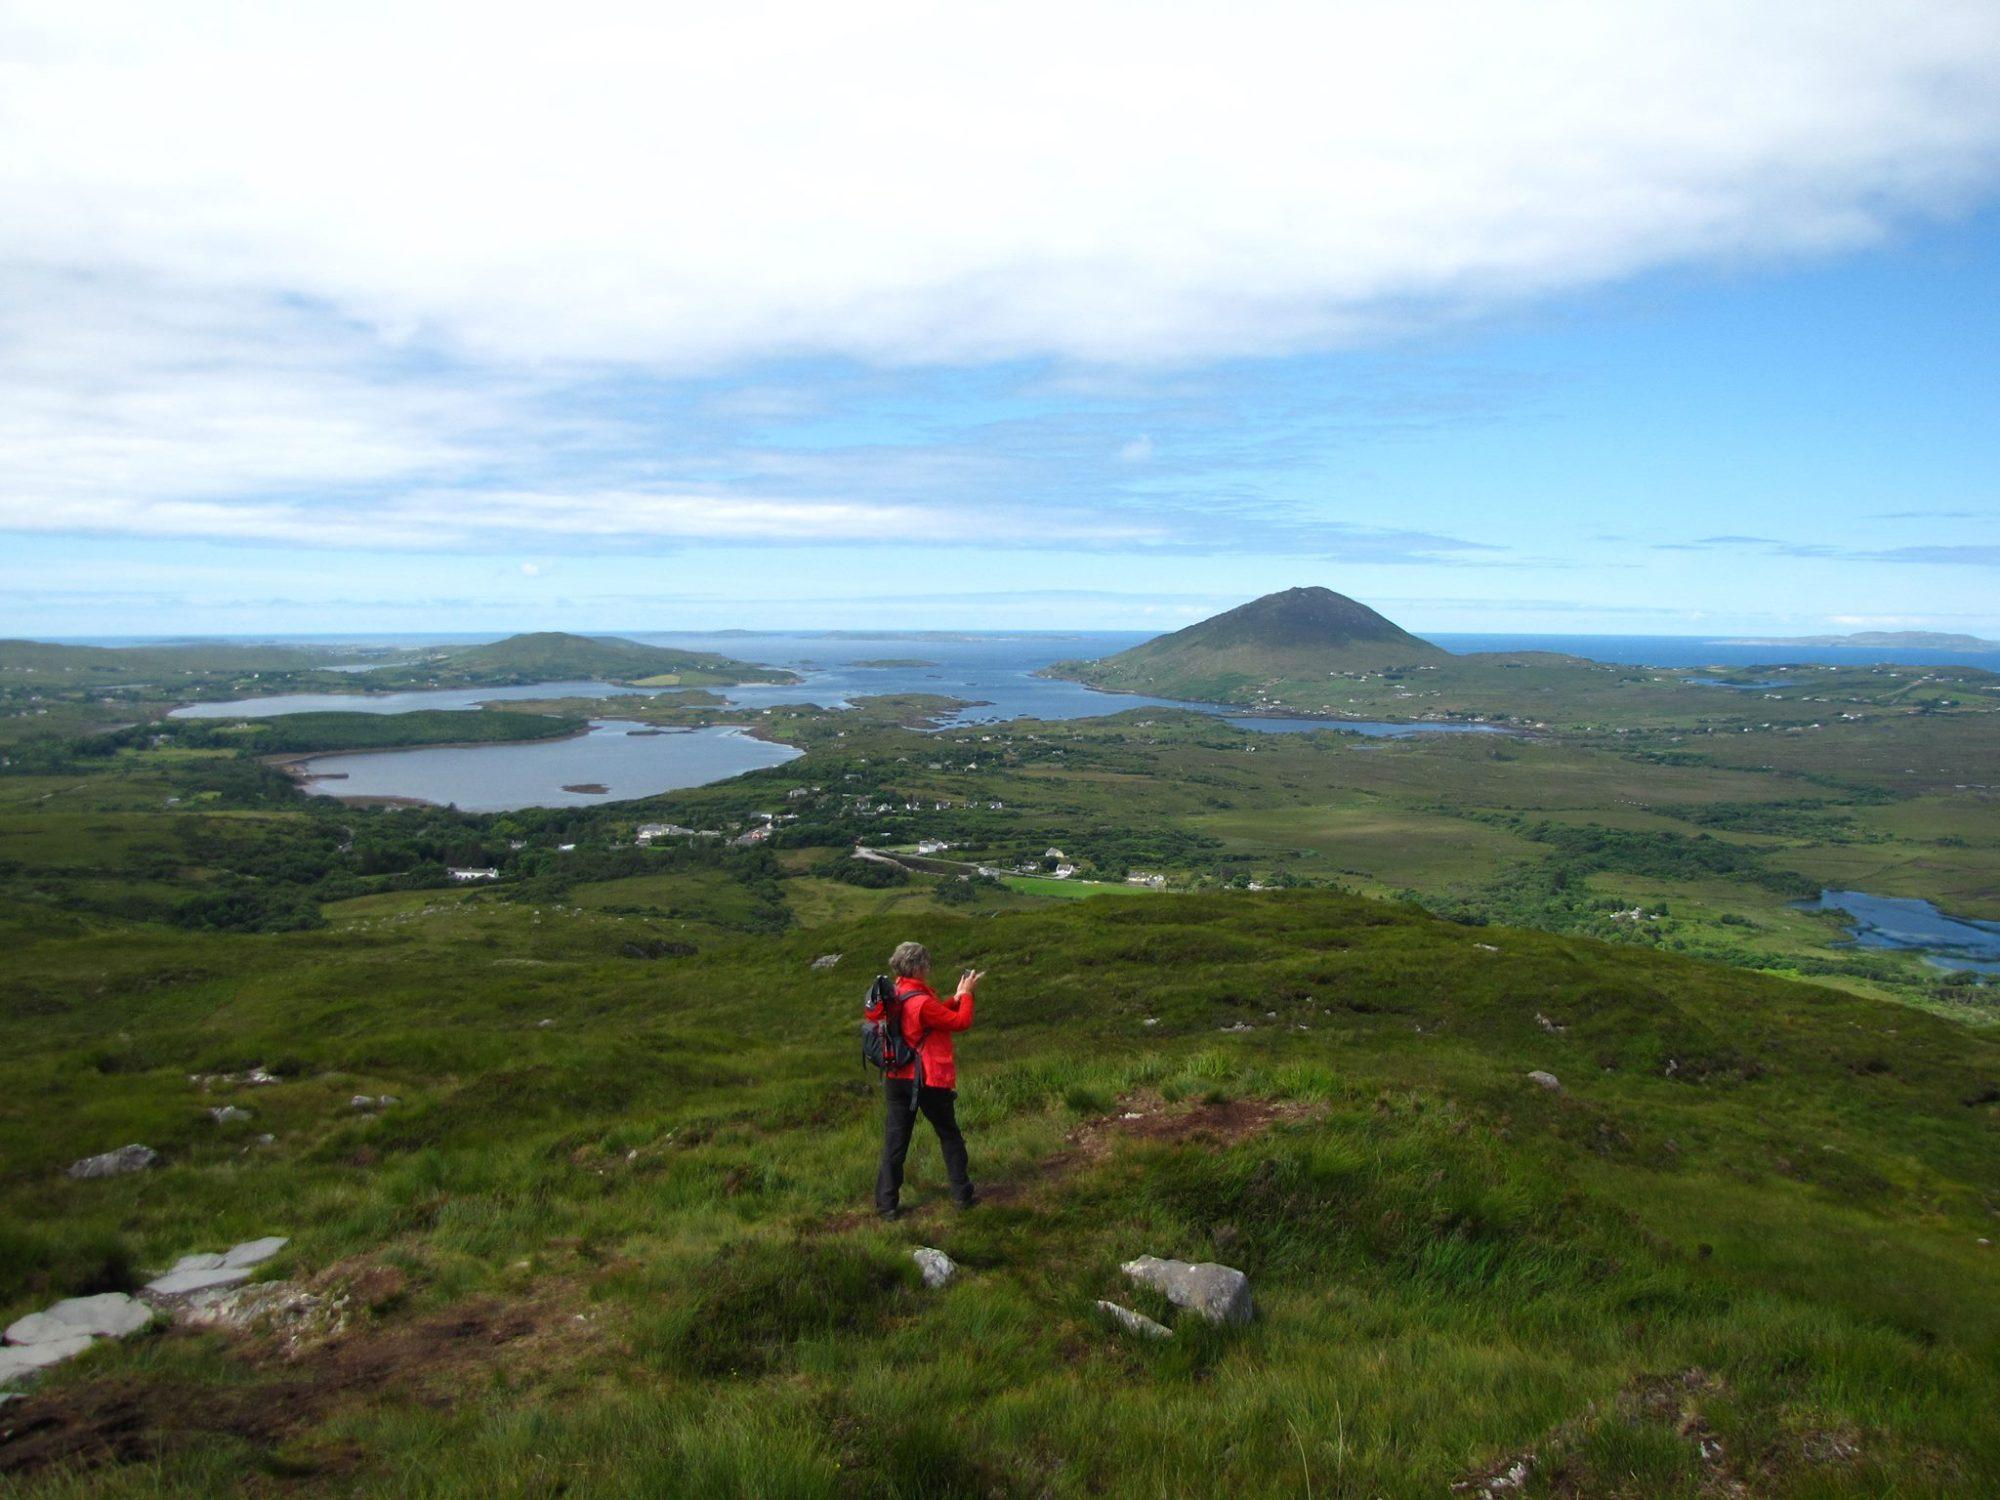 Top of the world - Ireland, Connemara